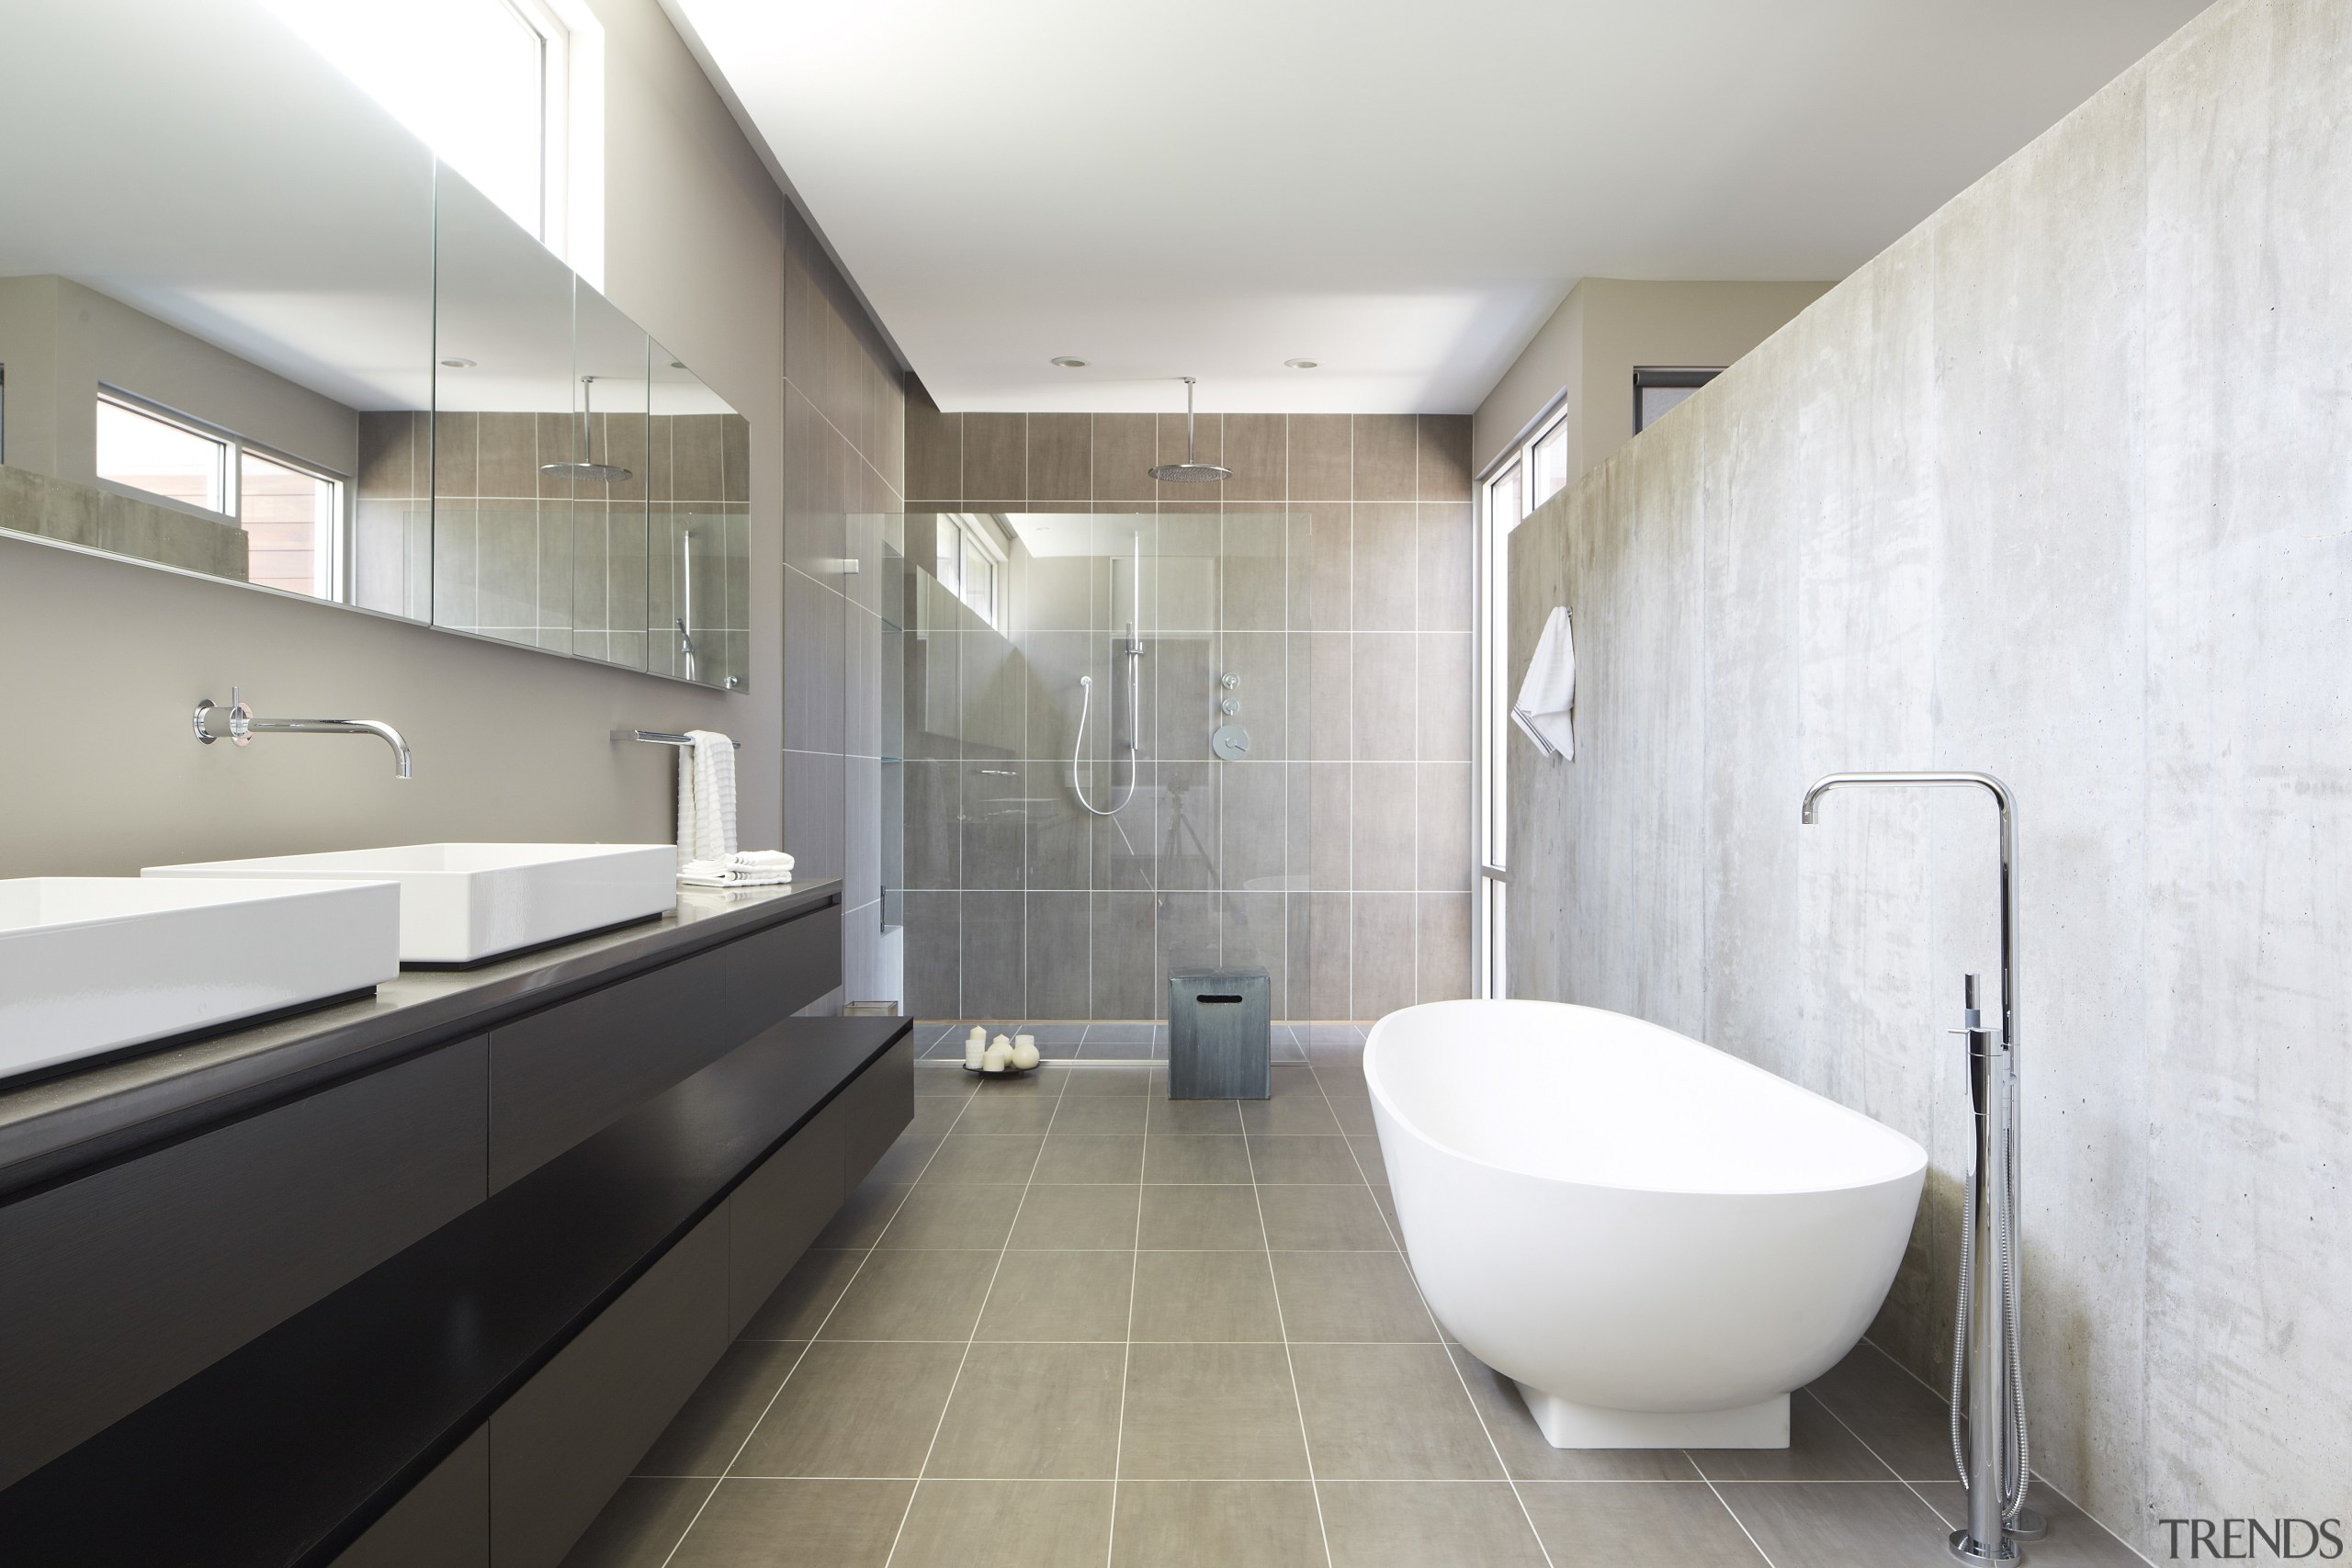 The handleless wenge vanity in this bathroom consists architecture, bathroom, floor, interior design, room, tile, gray, white